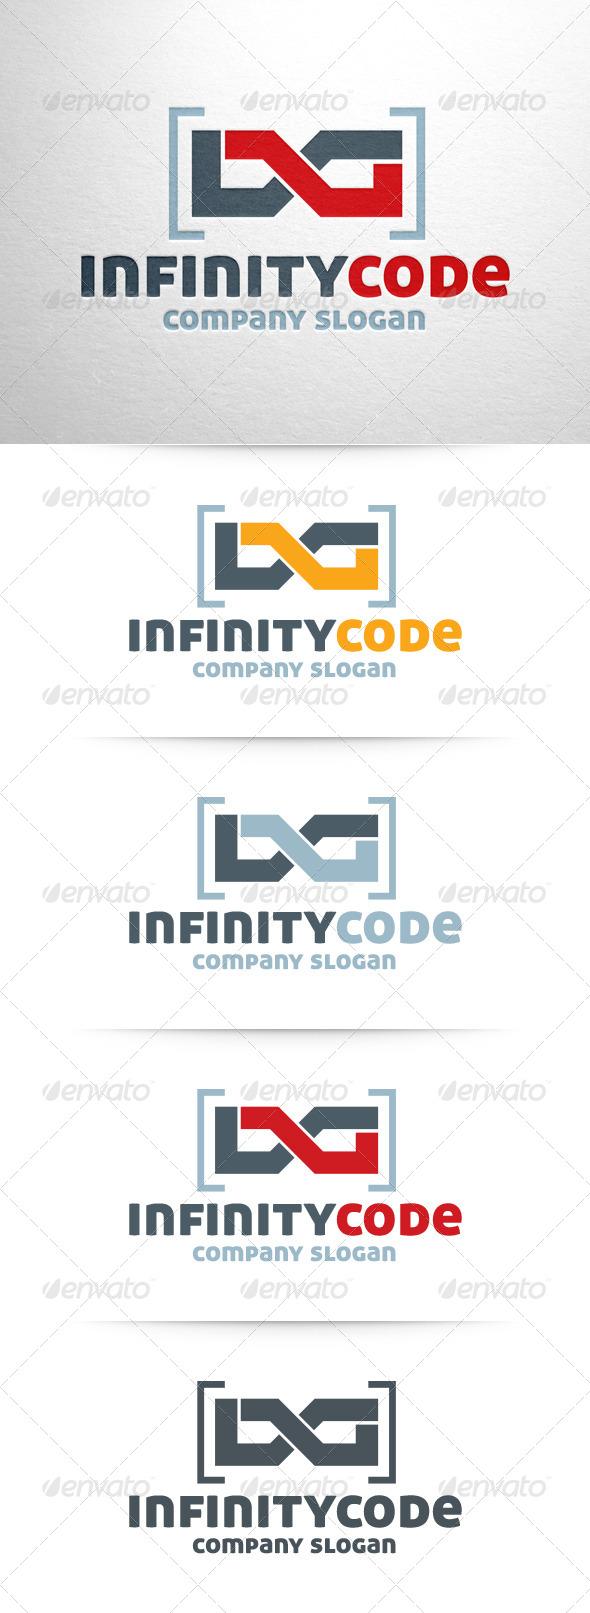 GraphicRiver Infinity Code Logo 6420870